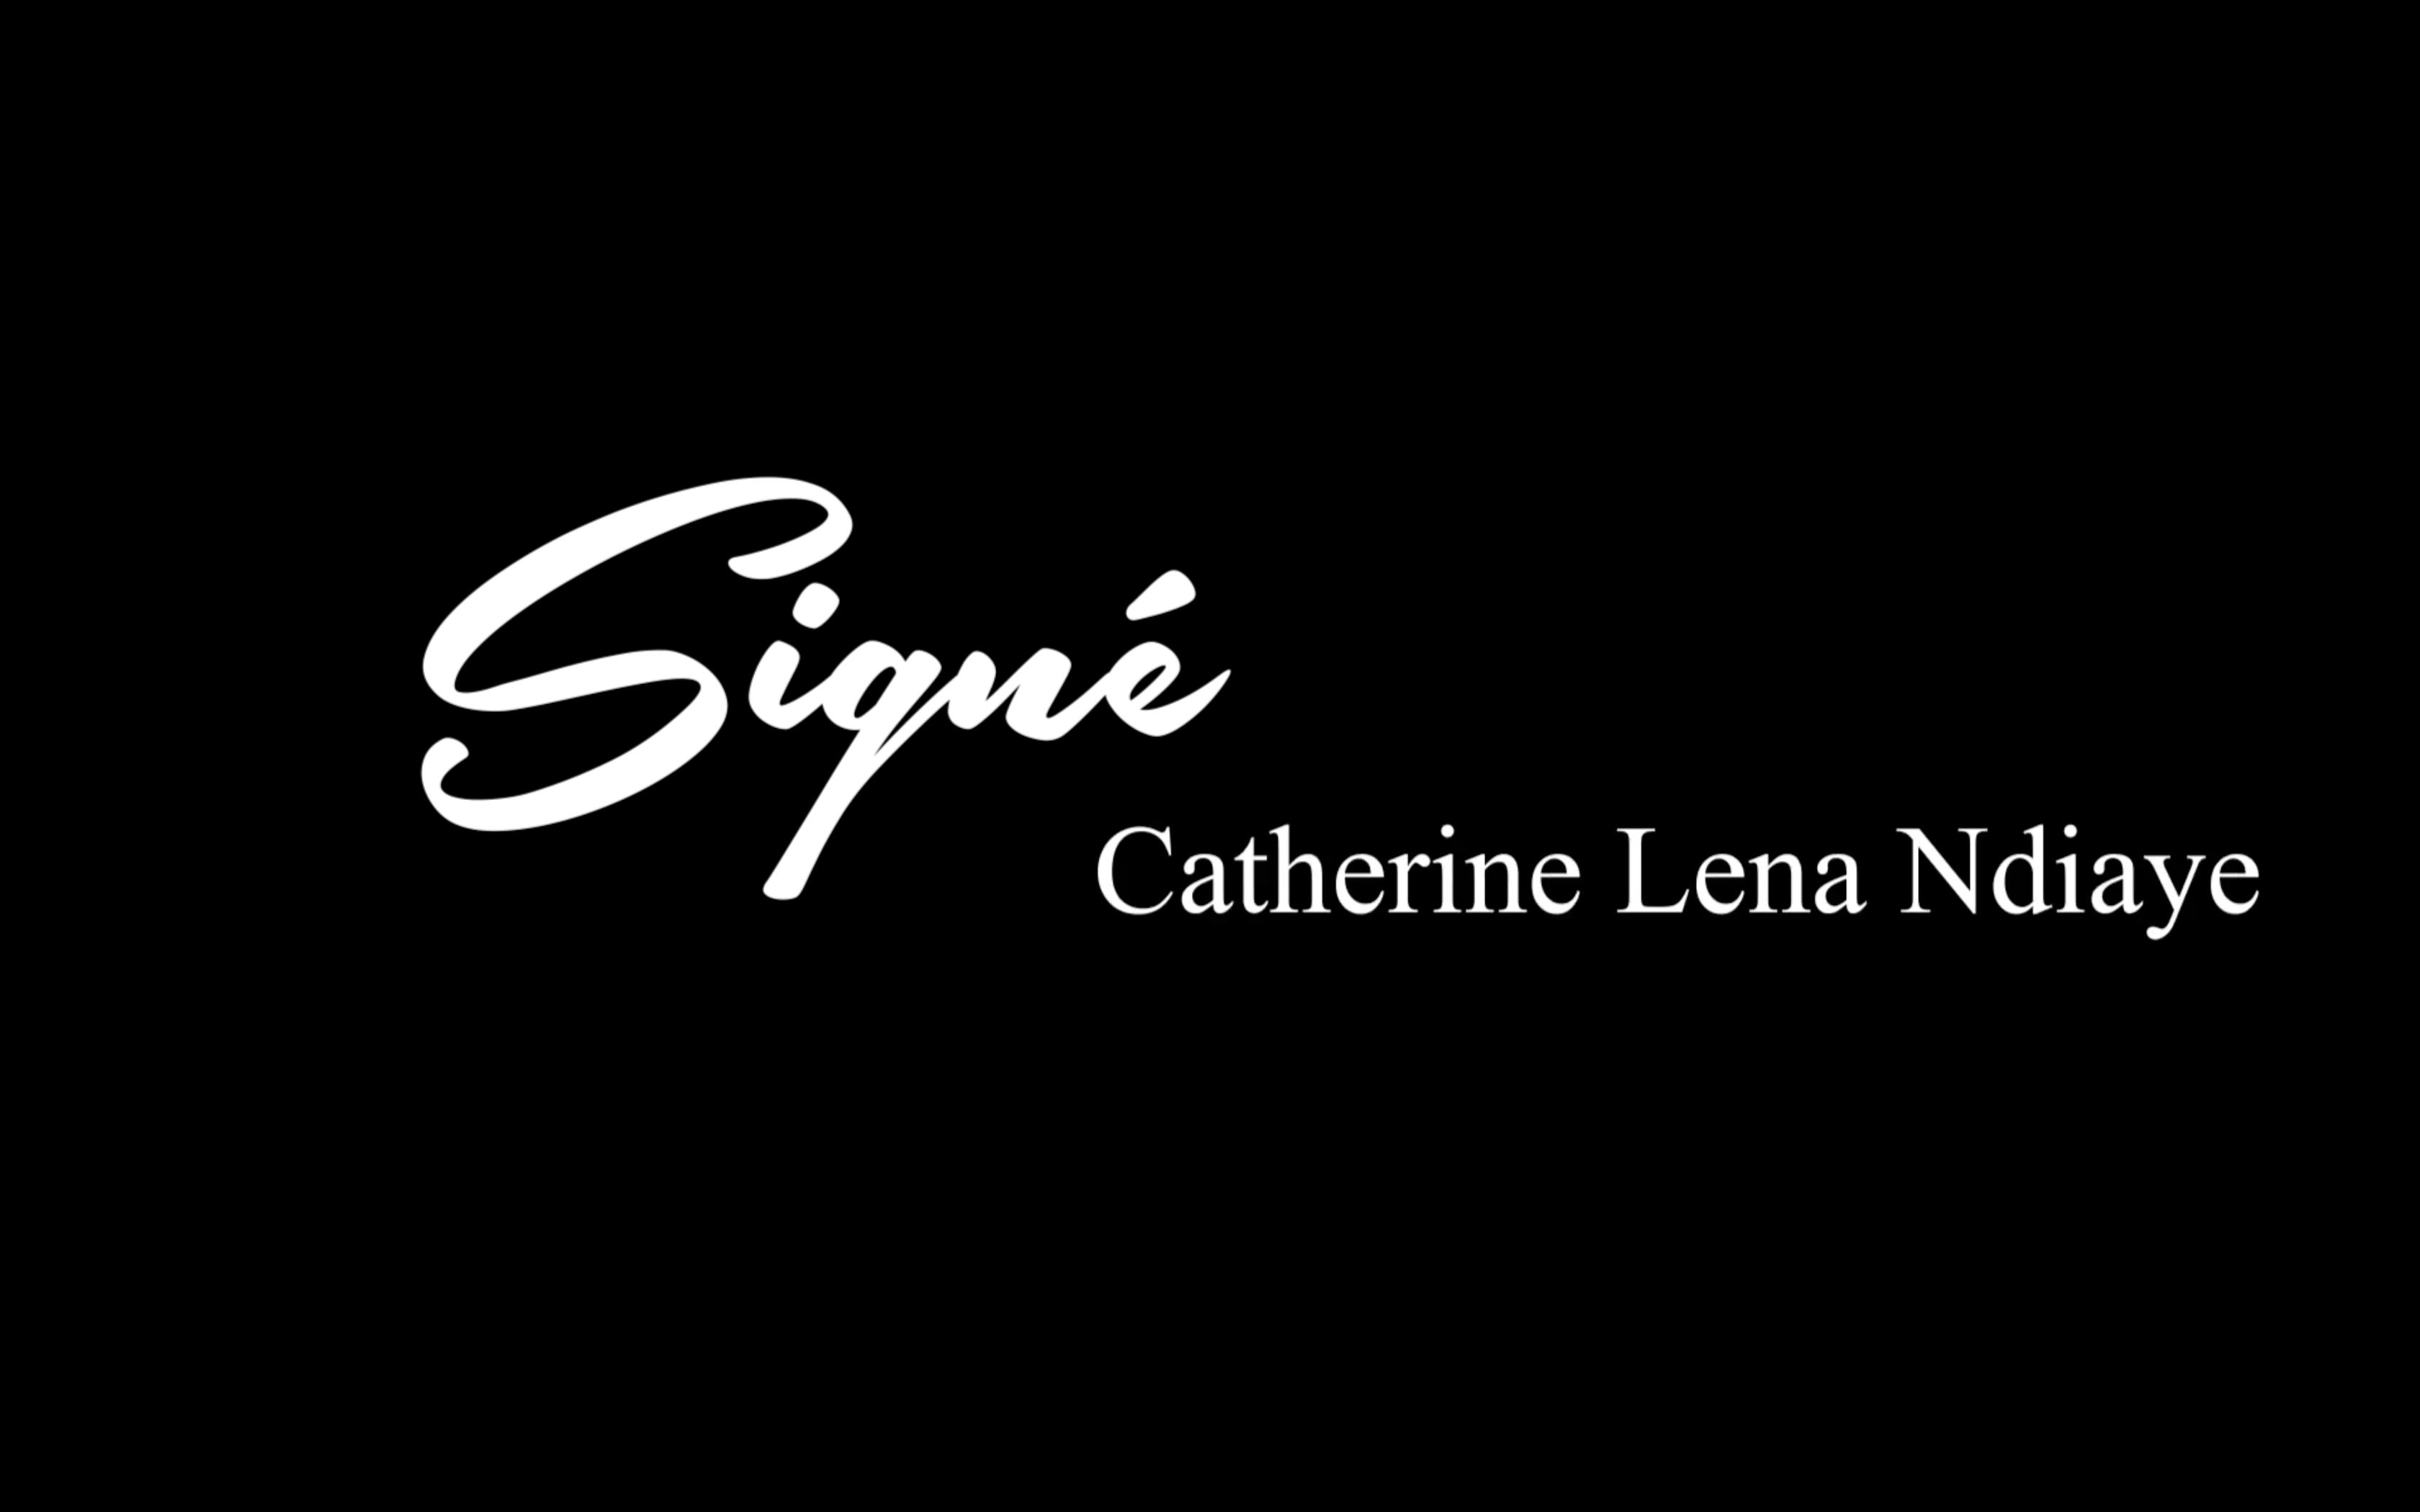 Signé Katy Lena Ndiaye